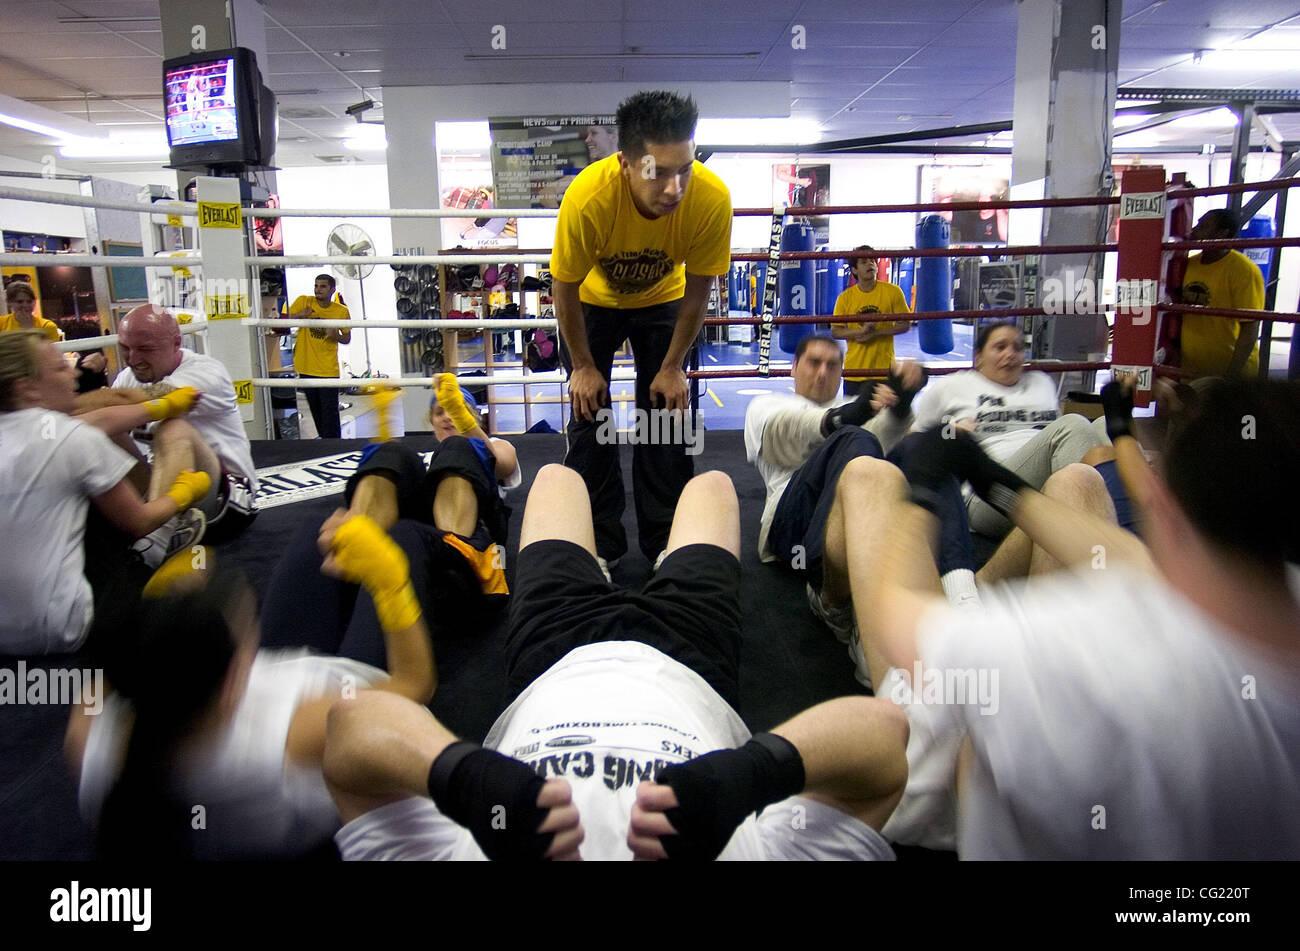 6fadeabf73 JUMP LEDE: Prime Time Boxing coach Fernando Santos leads a boxing camp  Monday, March